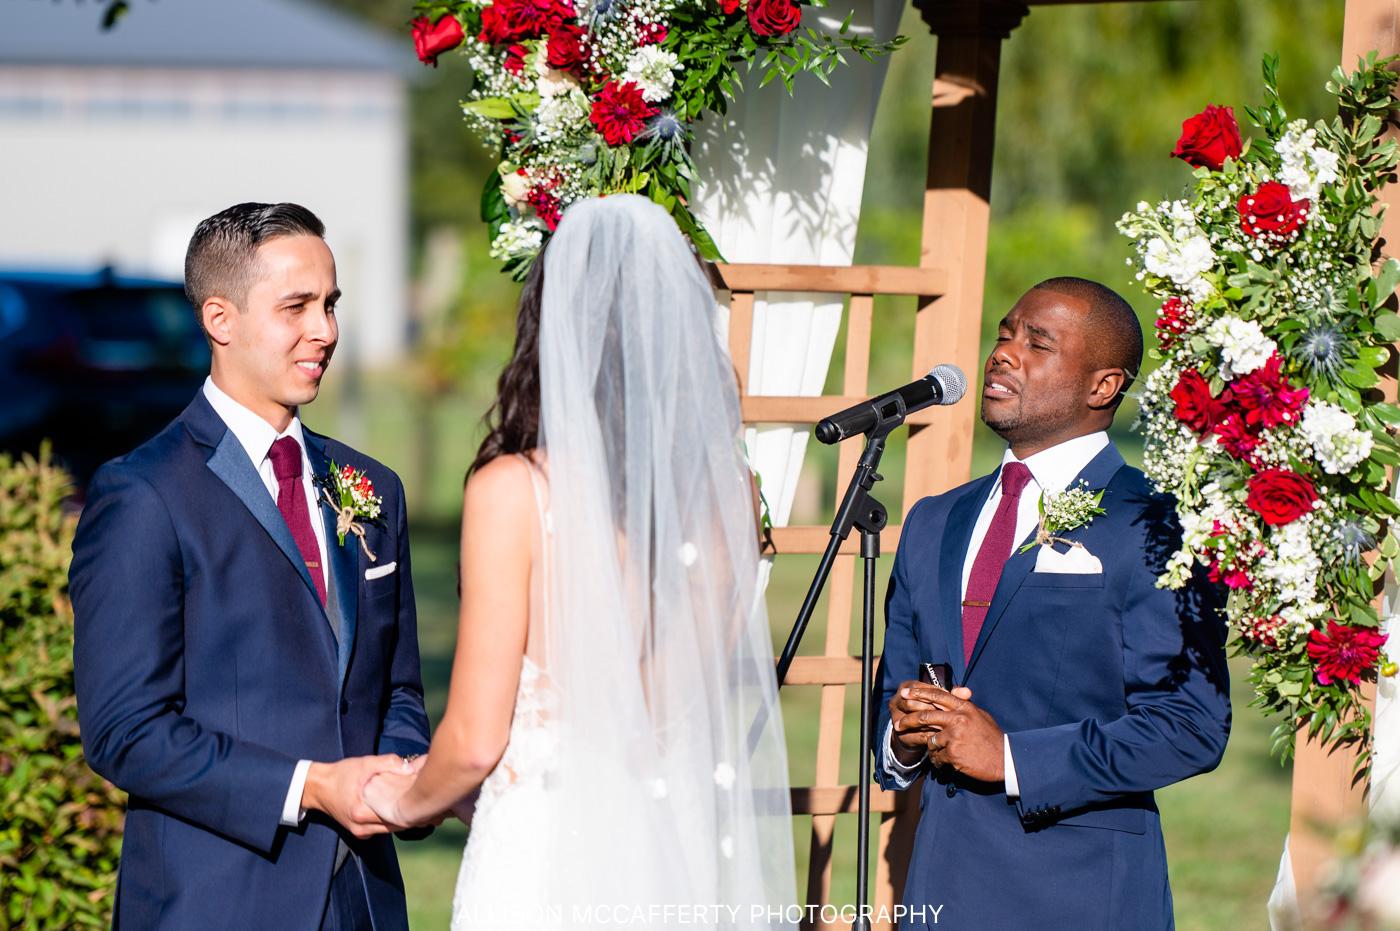 Valenzano Winery Pavilion Outdoor Wedding